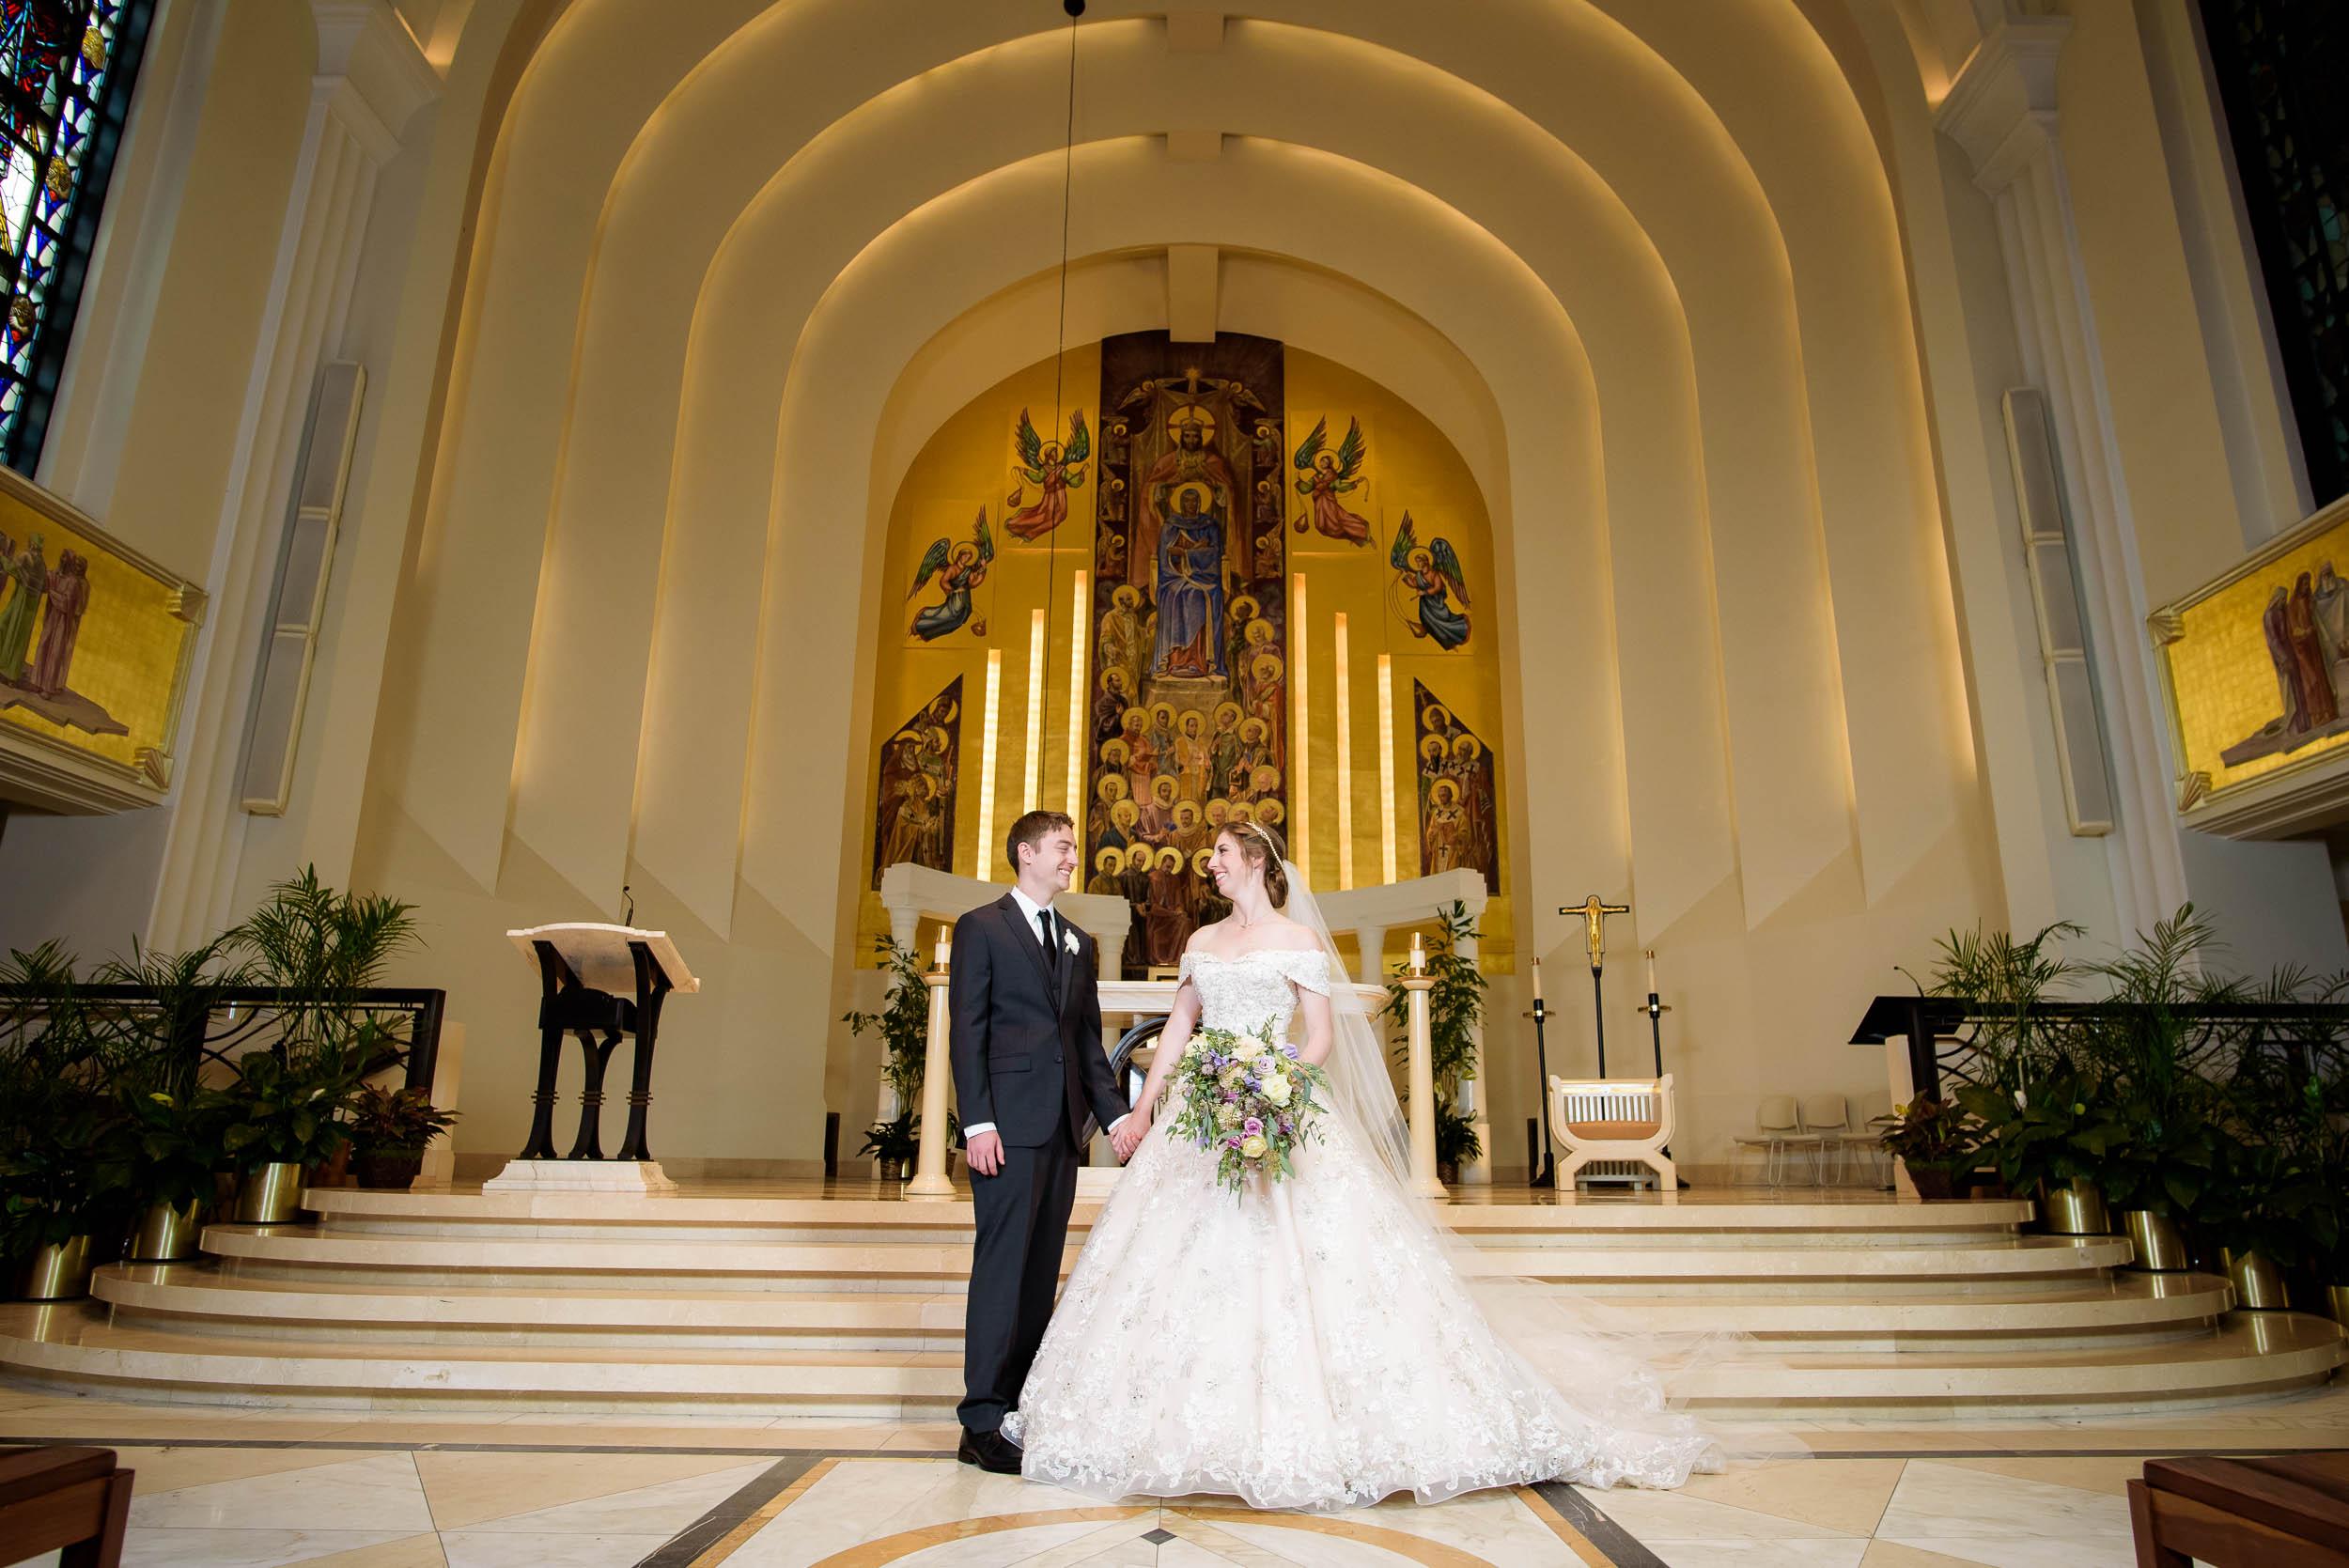 Portrait of the couple during a wedding ceremony at Madonna Della Strada.